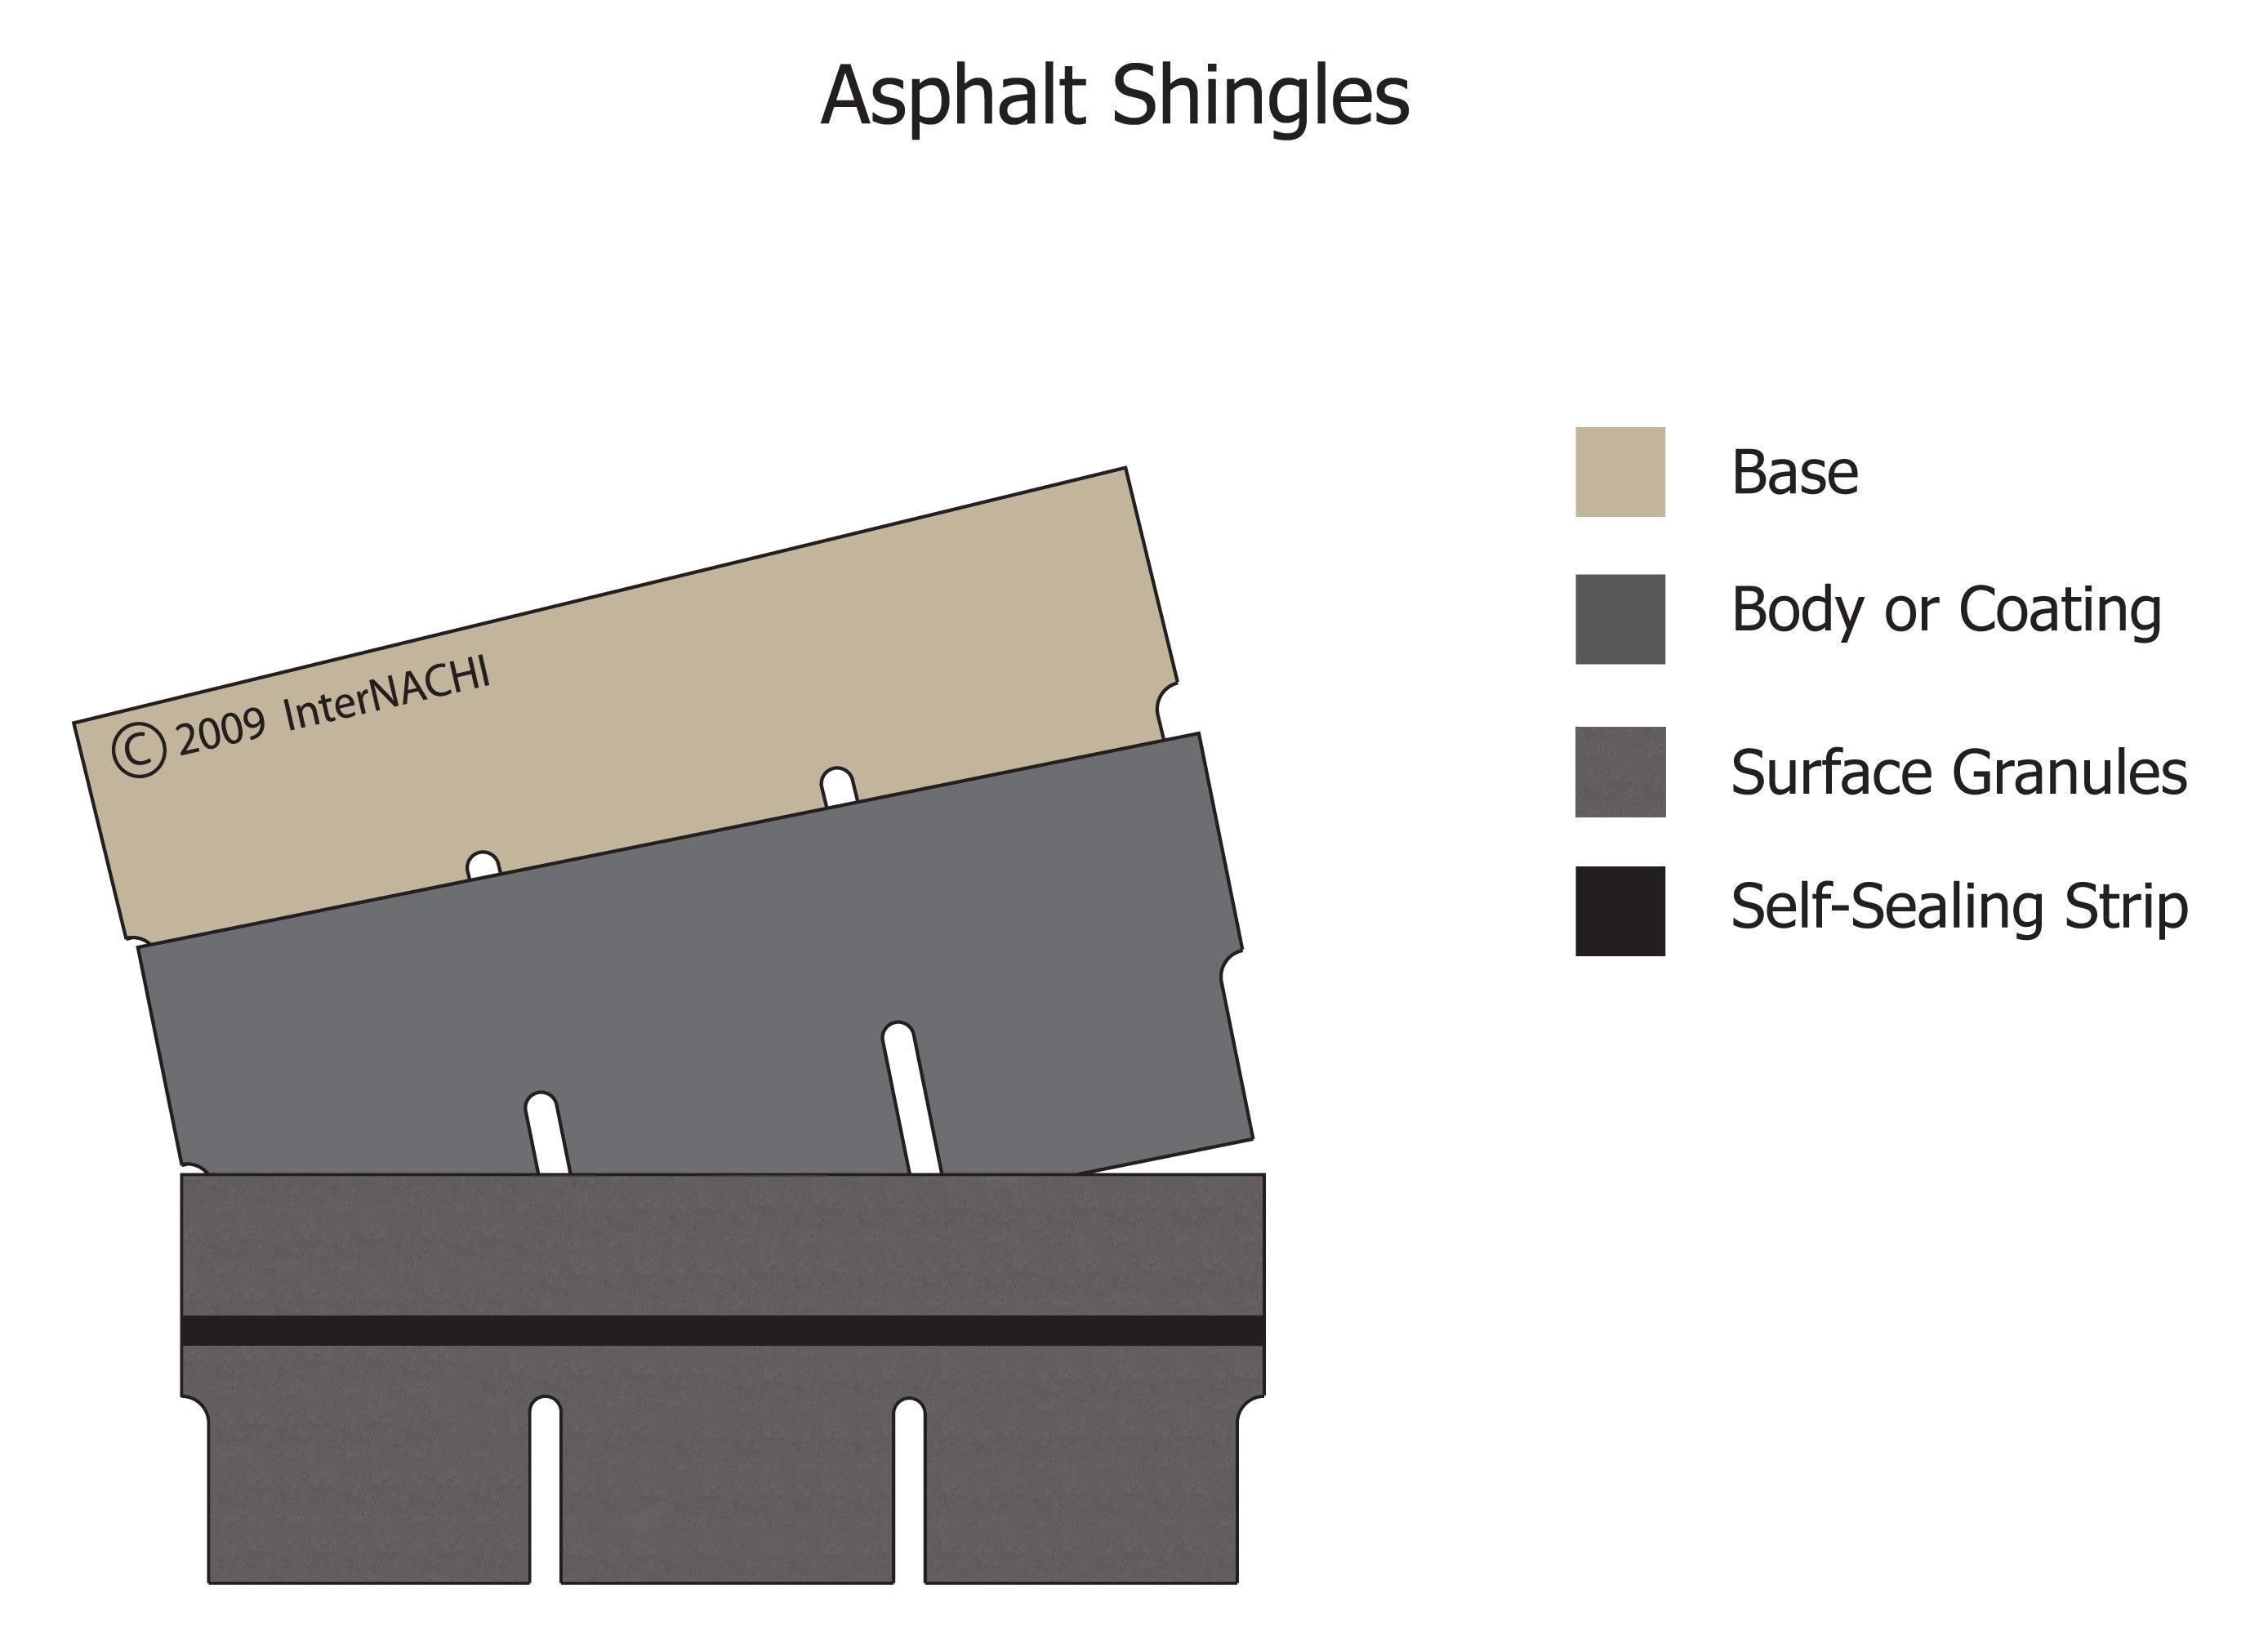 Asphalt shingles.